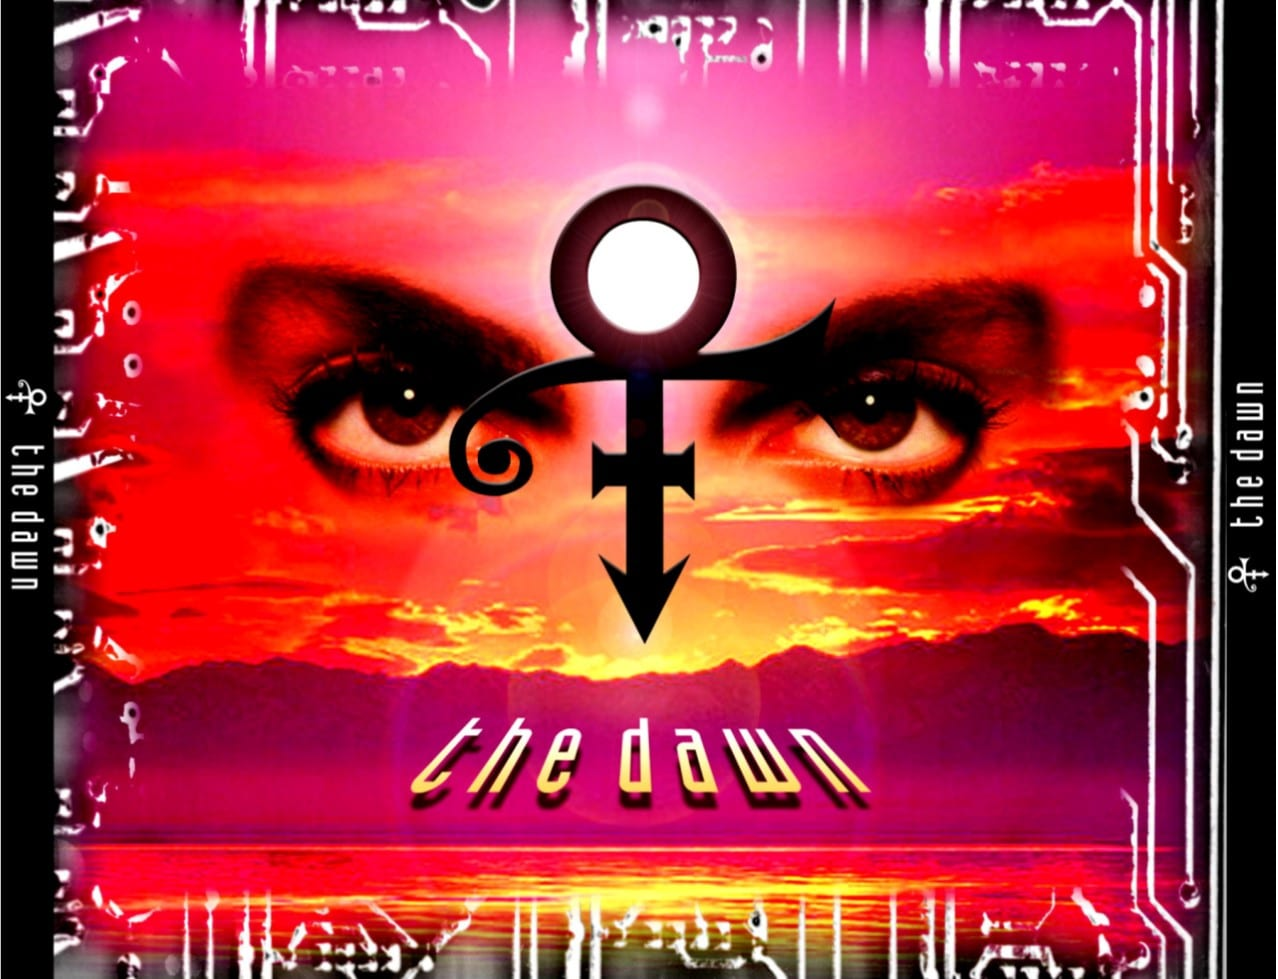 Prince - The Dawn (2008) 3 CD SET 15